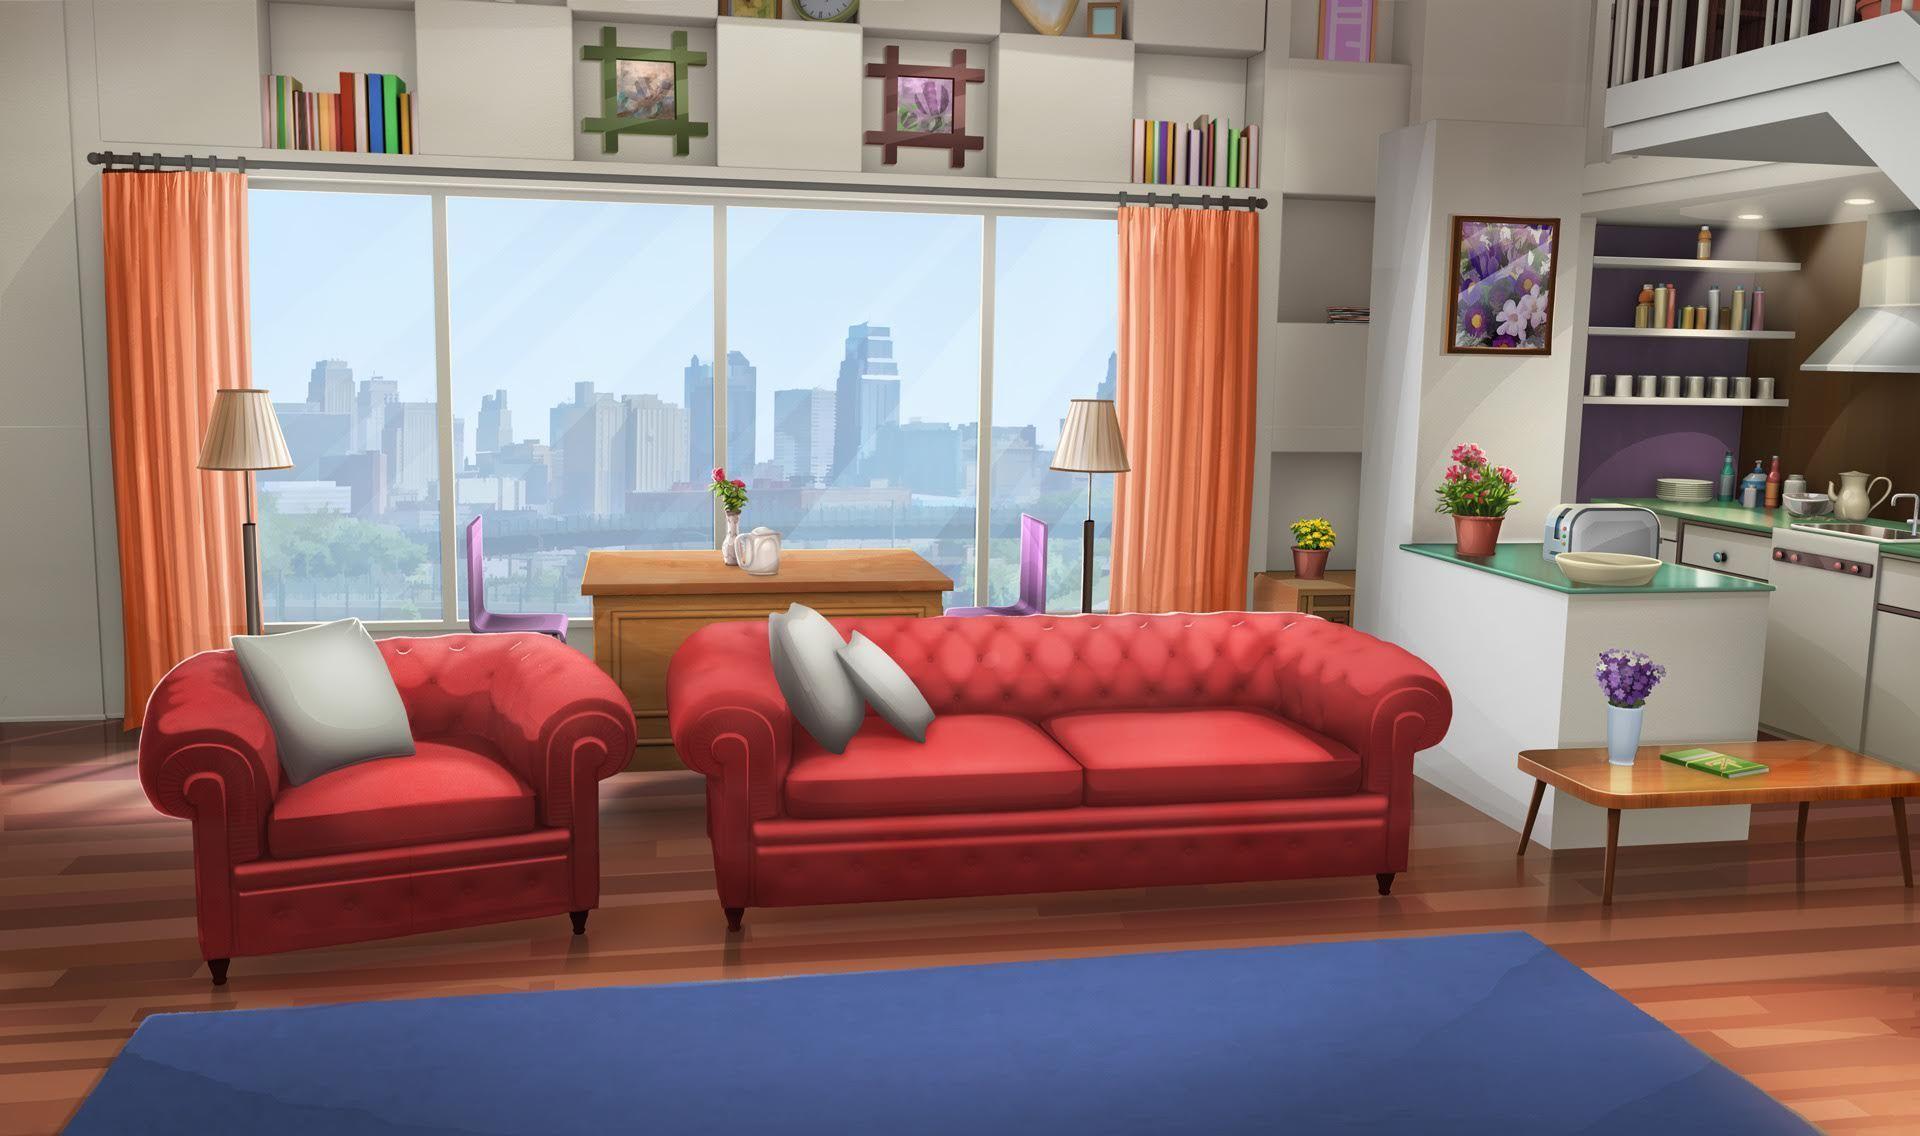 Anime Music Room Background In 2020 Living Room Background Anime Background Bedroom Designs Images